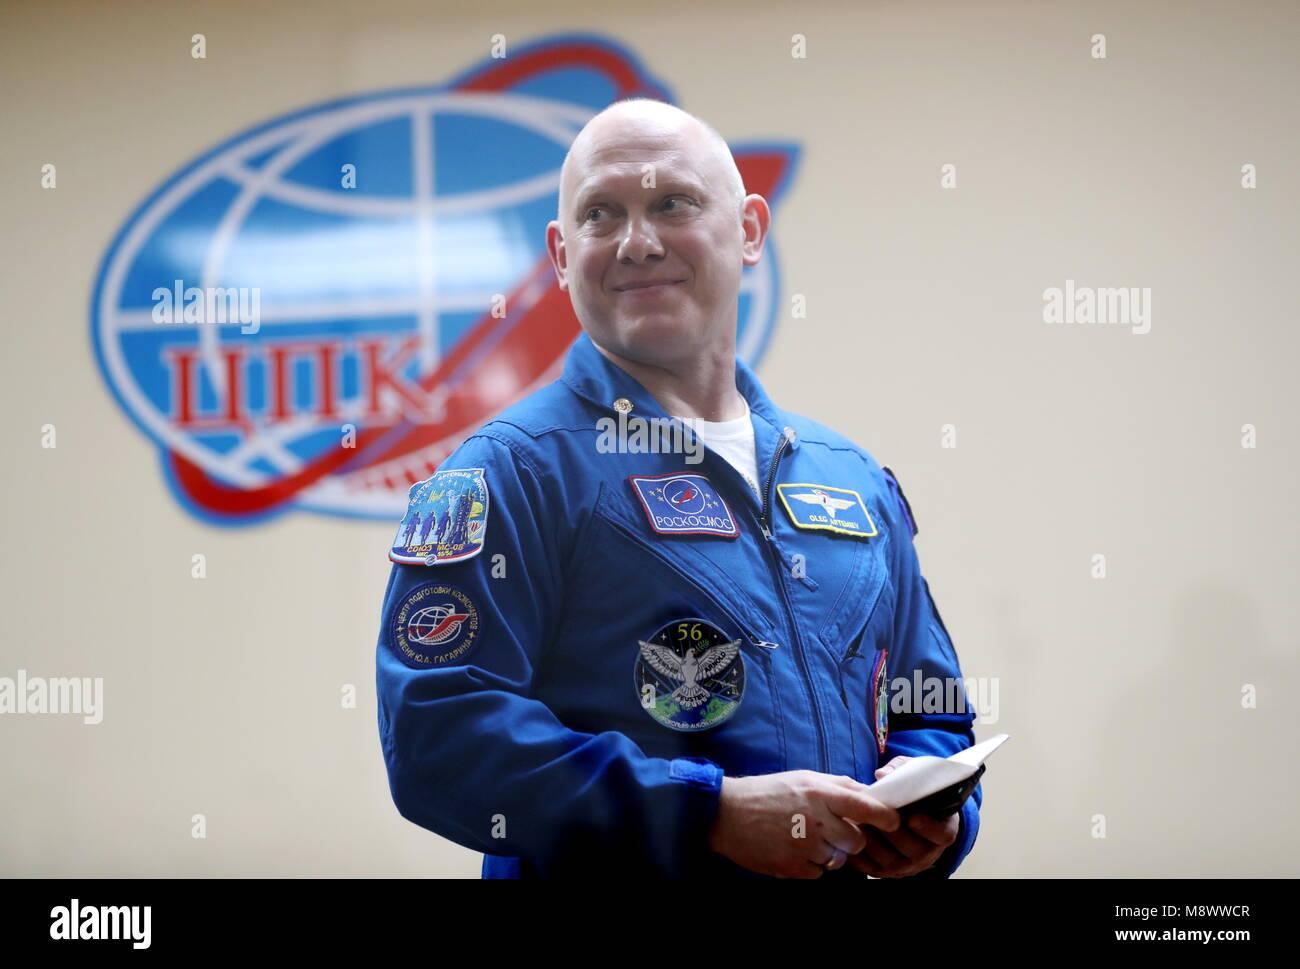 Baikonur, Kazakhstan. 20th Mar, 2018. BAIKONUR, KAZAKHSTAN - MARCH 20, 2018: Roscosmos cosmonaut Oleg Artemyev smiles Stock Photo